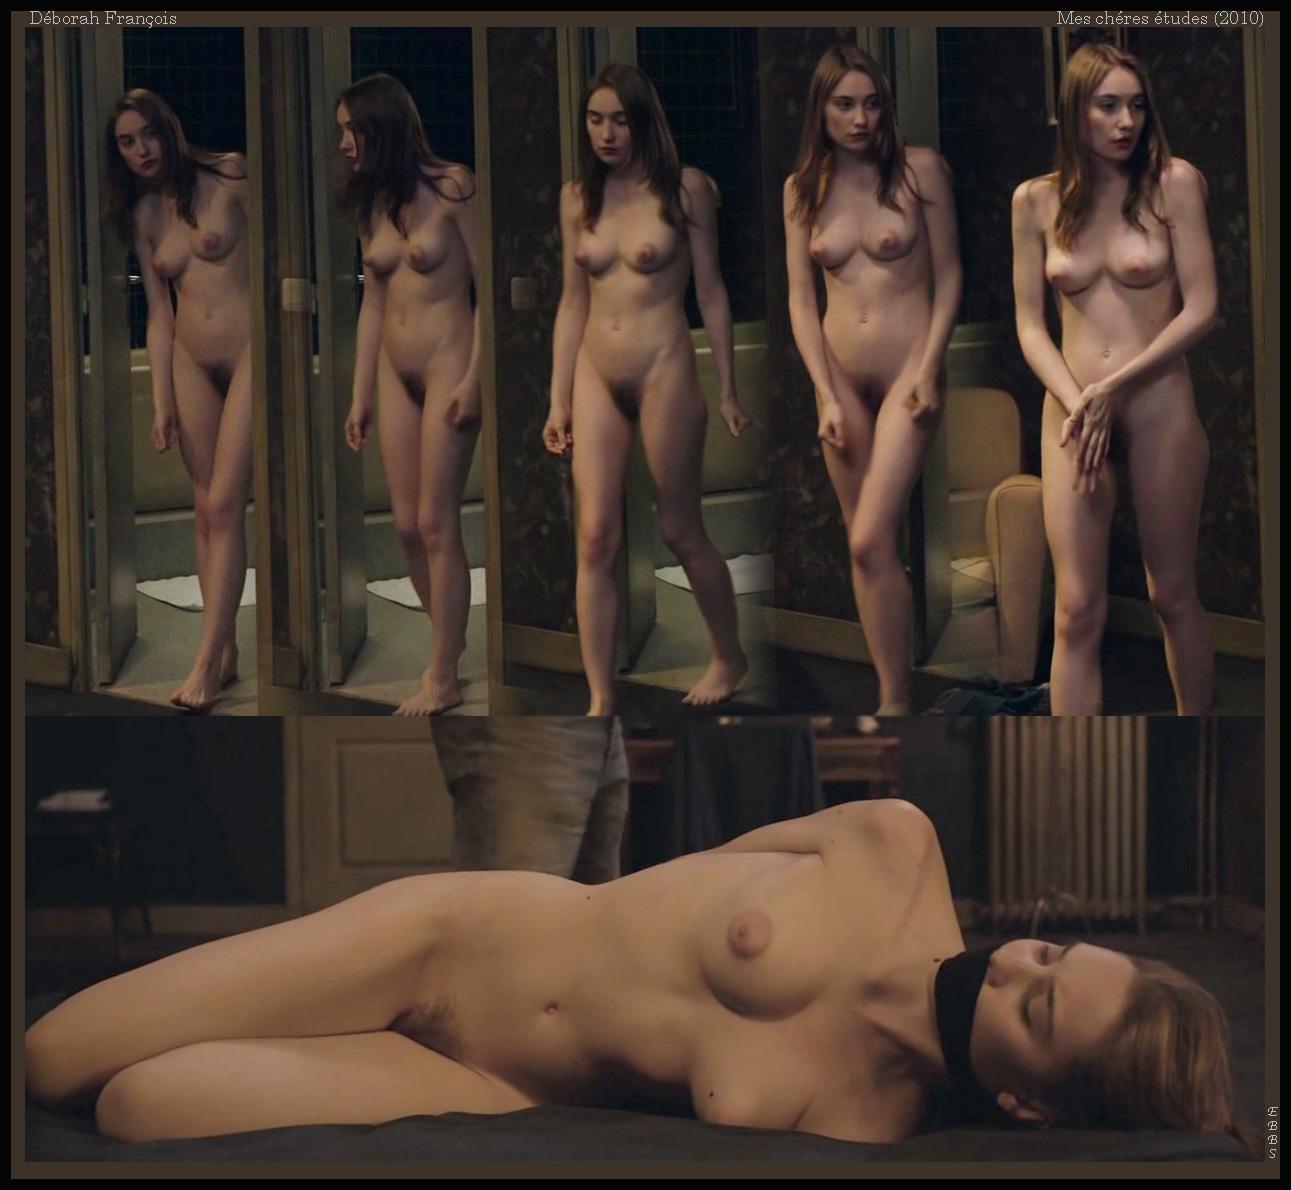 Francoise robertson nude